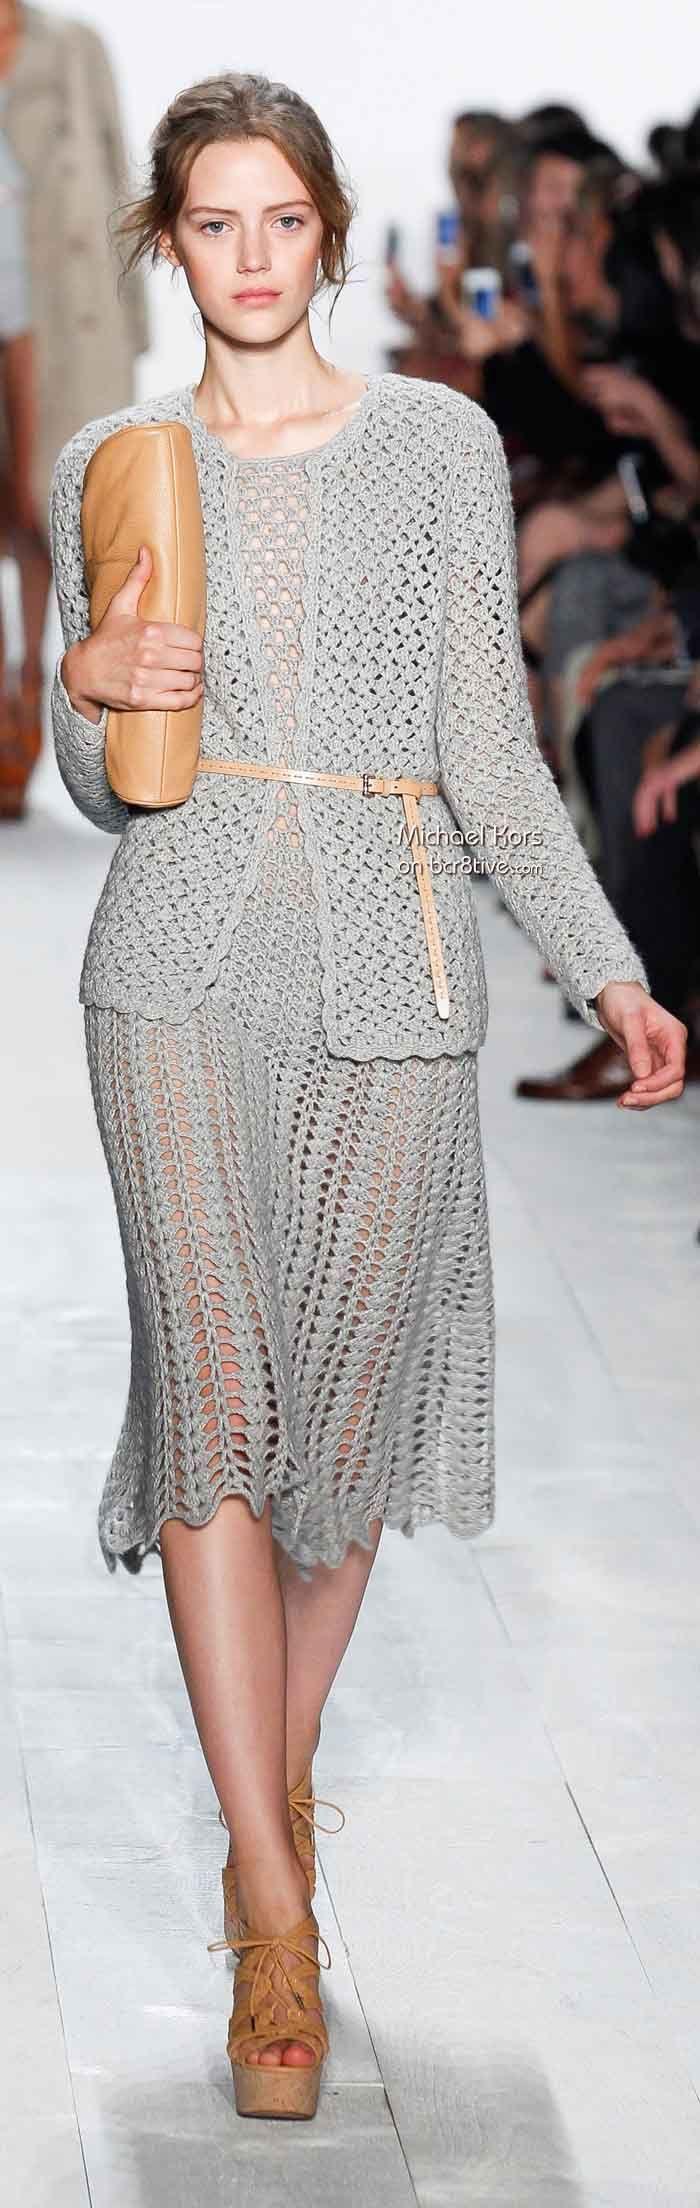 Michael Kors Spring 2014 - Crochet Fashion